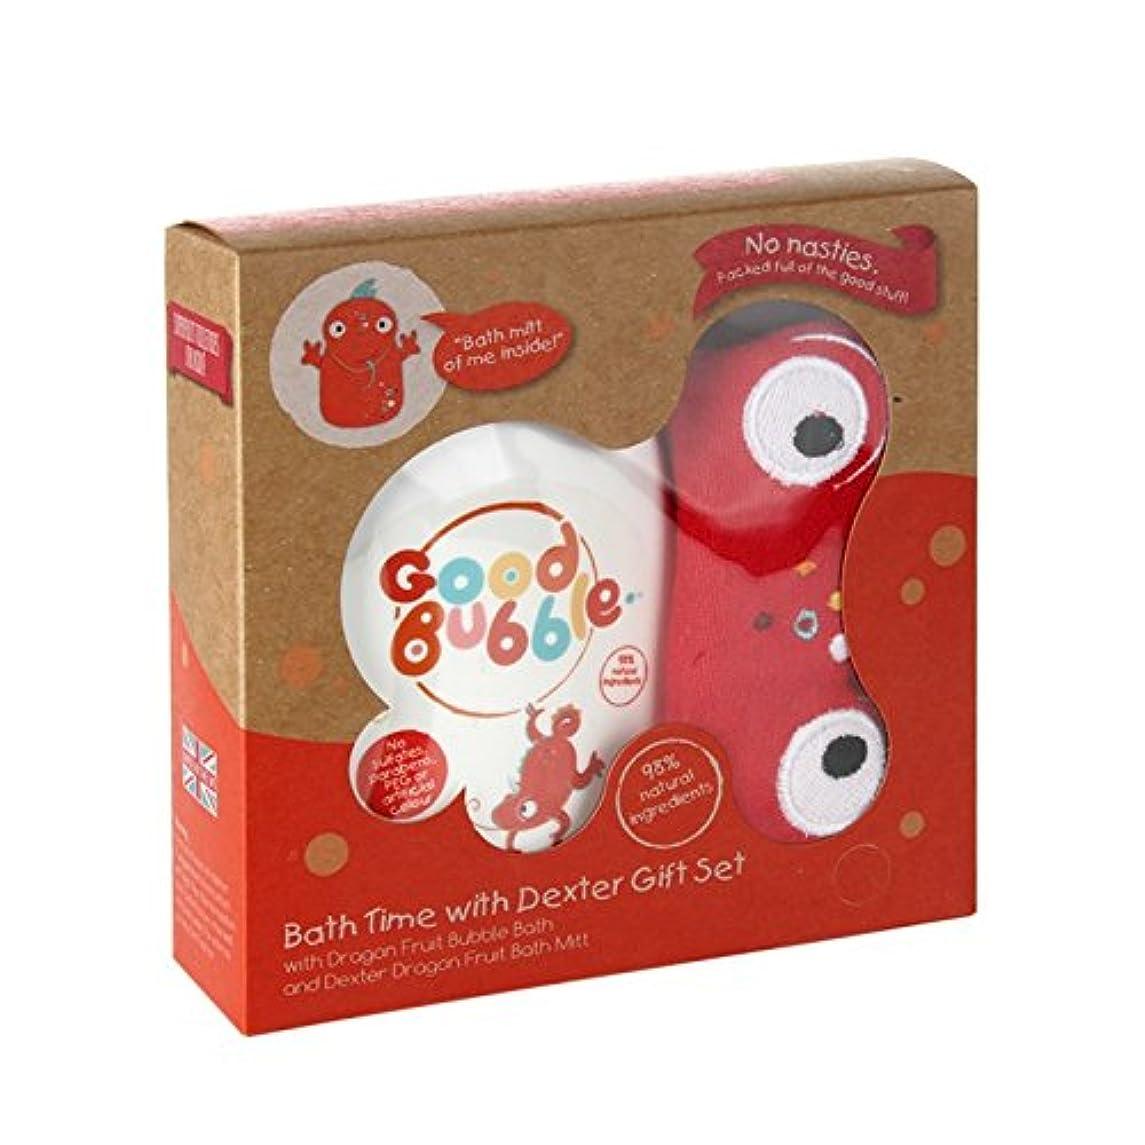 Good Bubble Dexter Dragonfruit Gift Set 550g (Pack of 6) - 良いバブルデクスターDragonfruitギフトセット550グラム (x6) [並行輸入品]